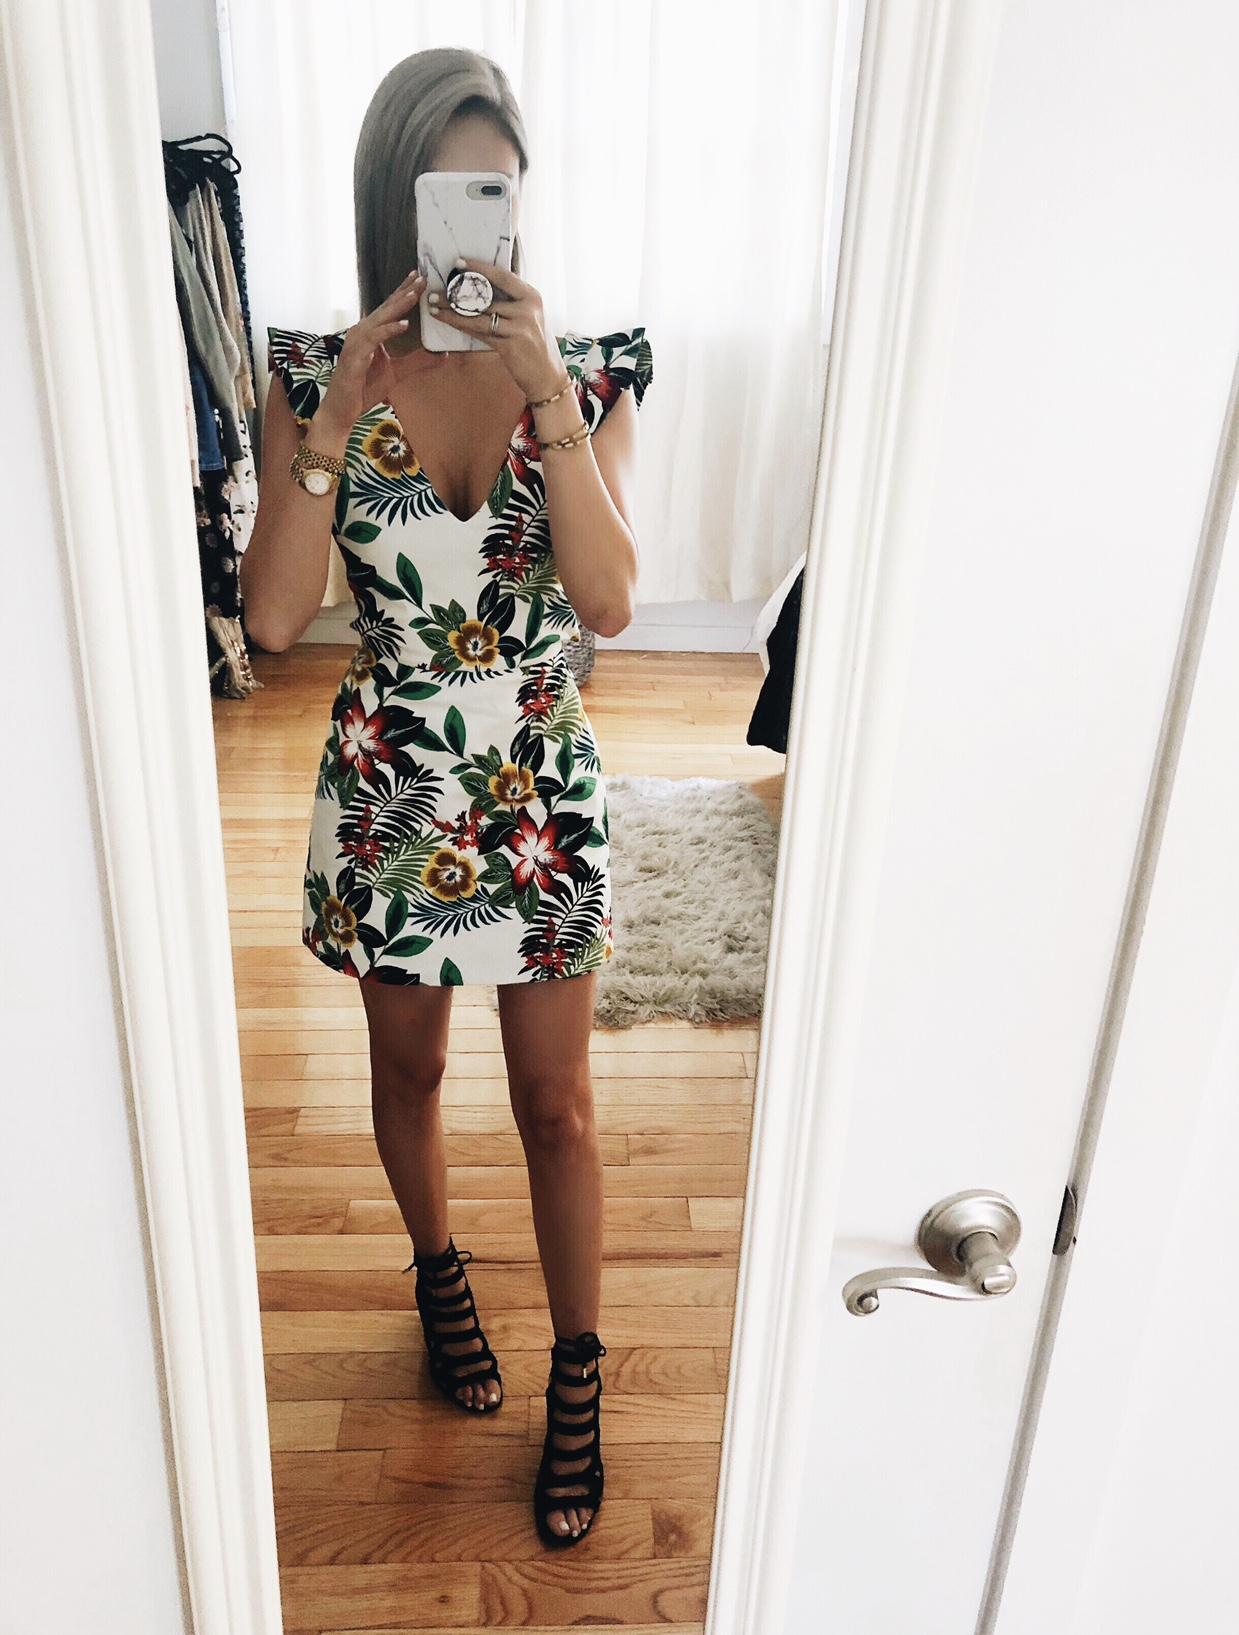 Recreate the Look: - Romper Dress: ZaraWrap Around Watch: Michael KorsShoes: Franco Sarto